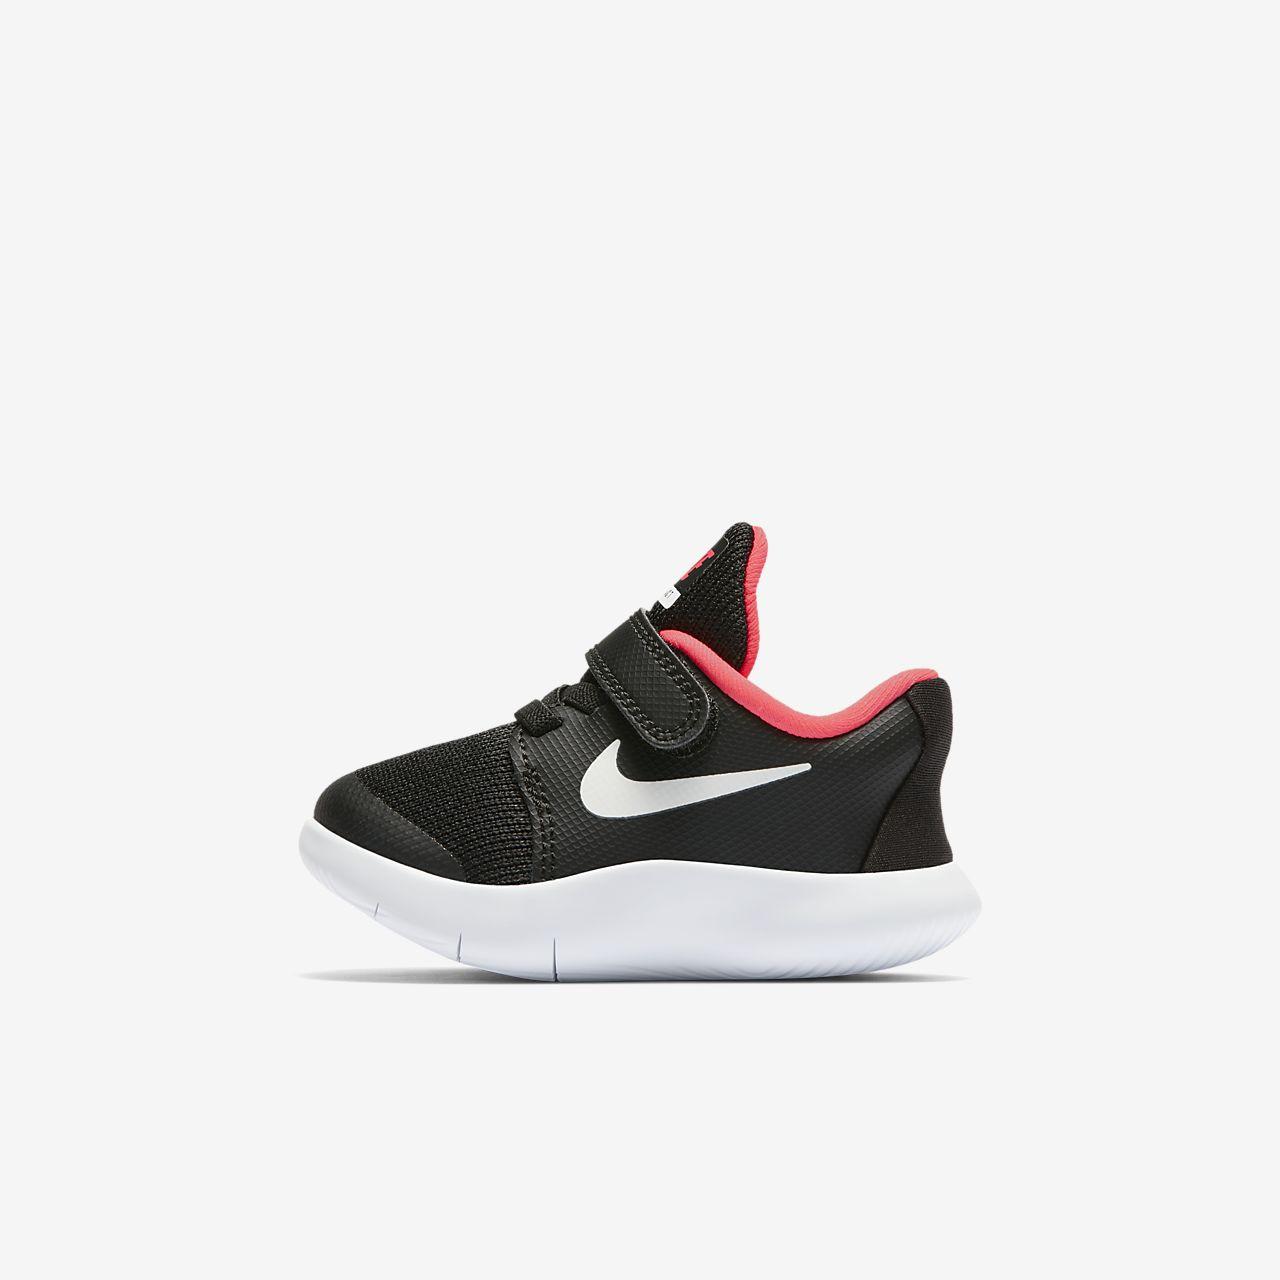 newest 833d5 af0dd ... Nike Flex Contact 2 Zapatillas - Bebé e infantil